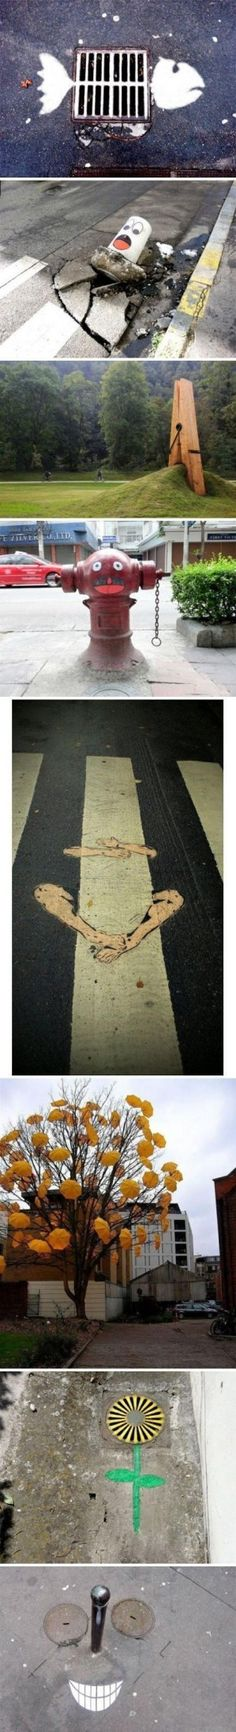 Interesting street arts